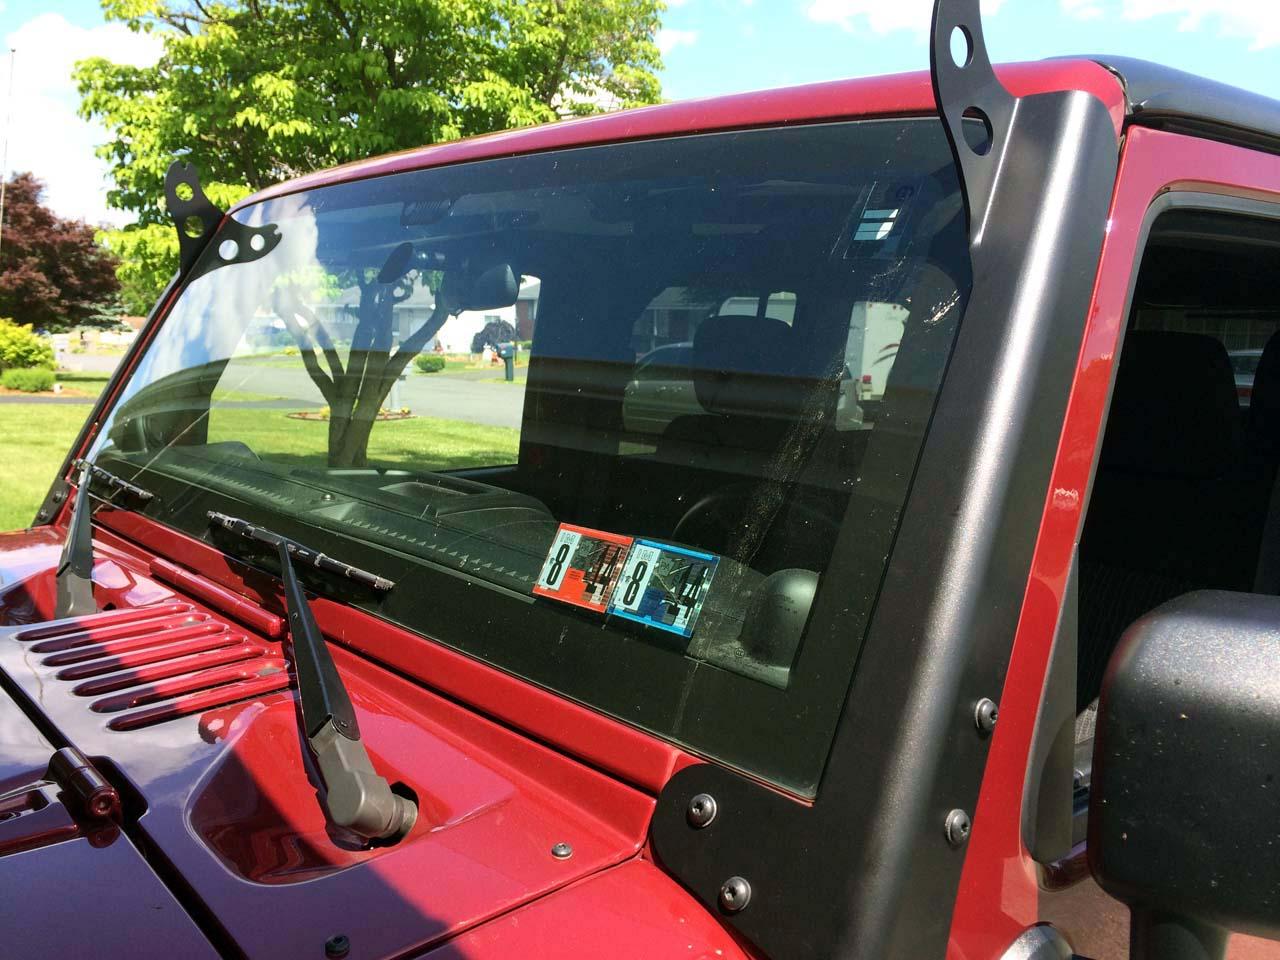 Jeep Tj Light Bar Wiring from www.jeepfan.com